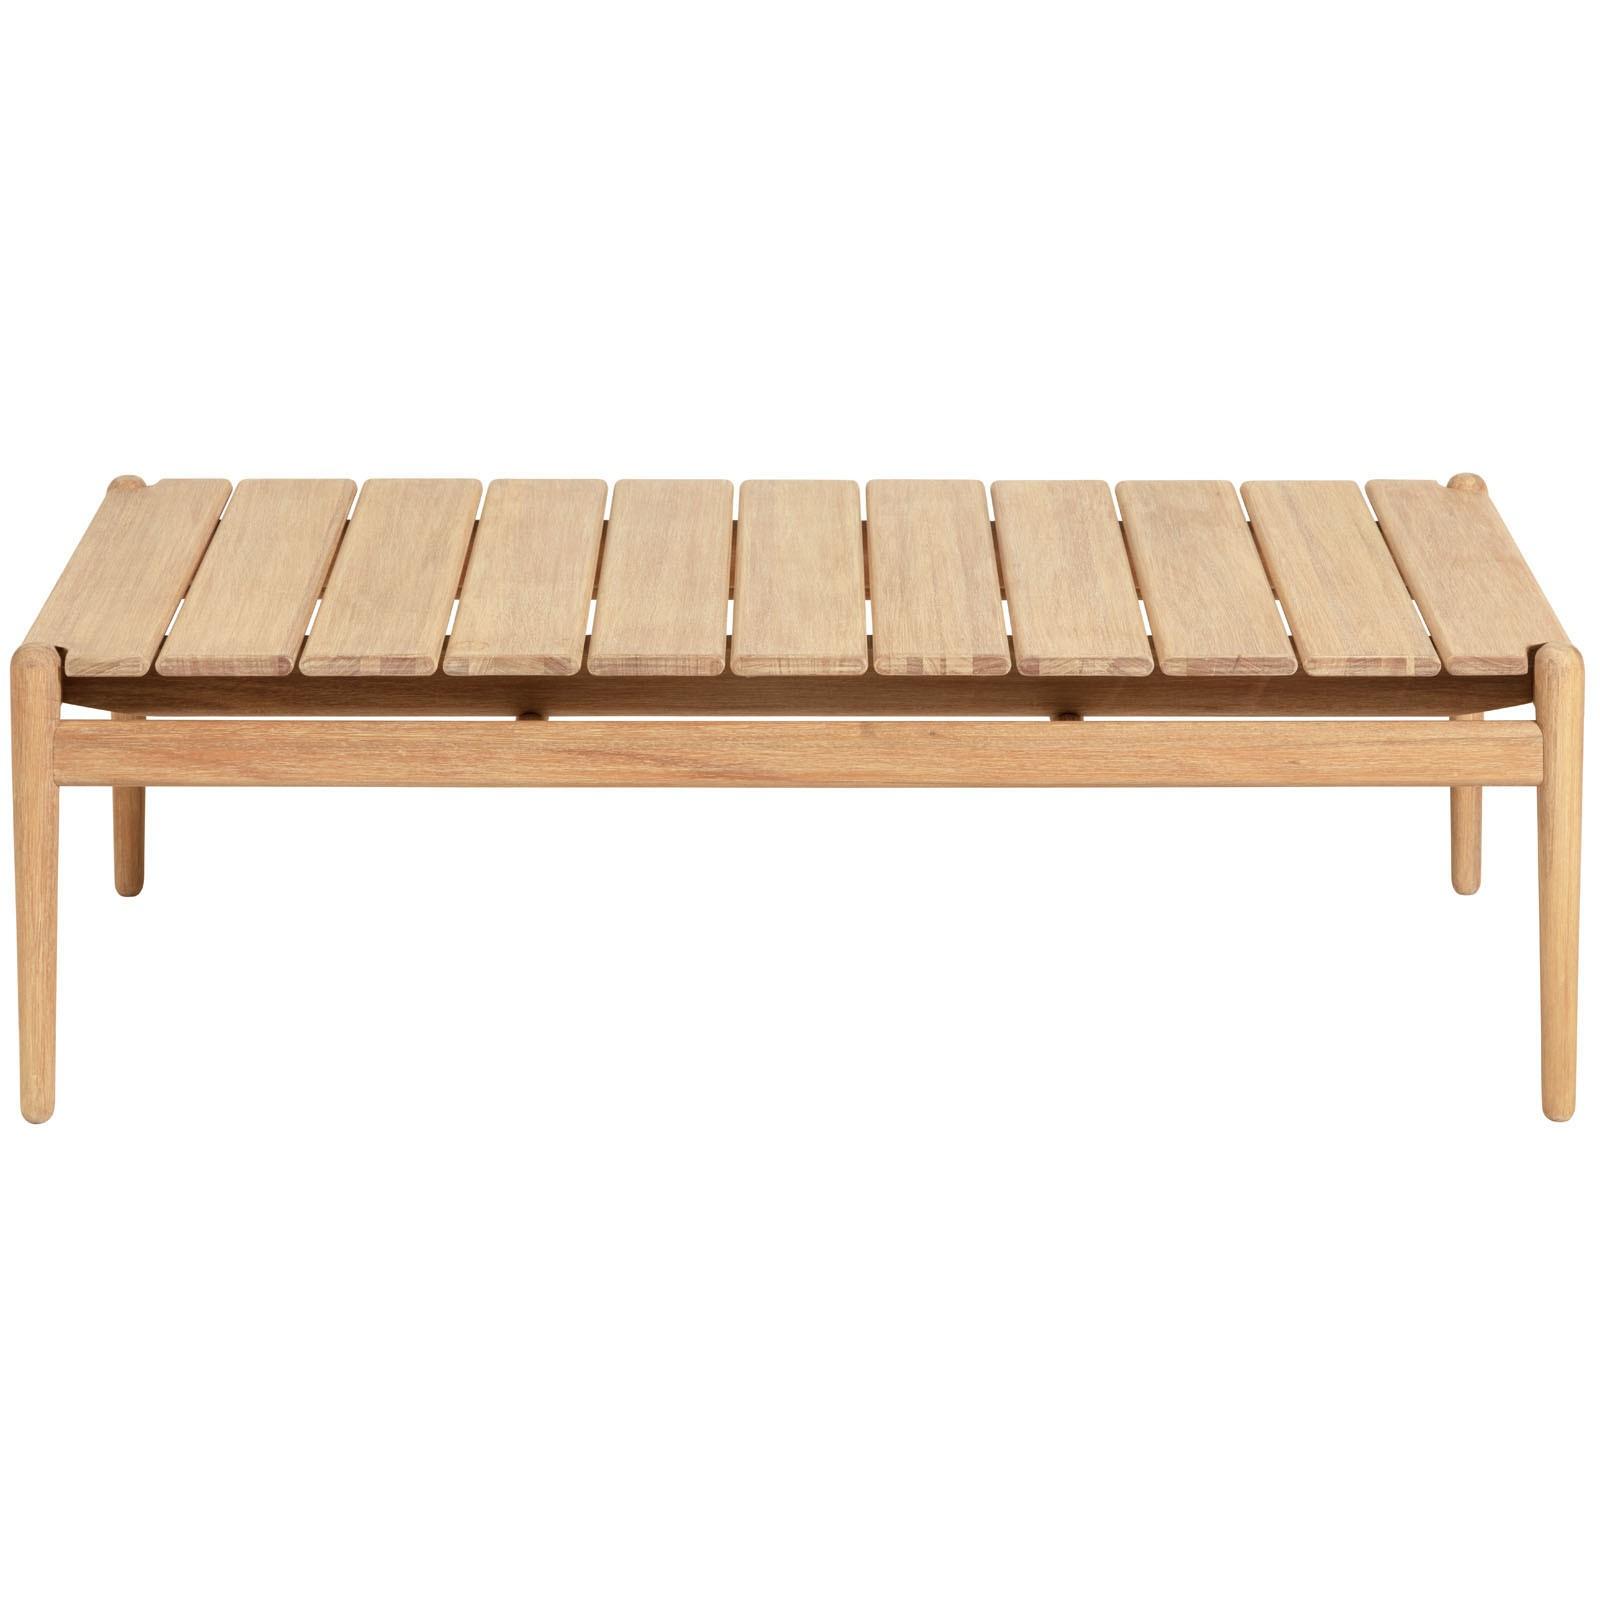 Lomond Eucalyptus Timber Alfresco Coffee Table, 117cm